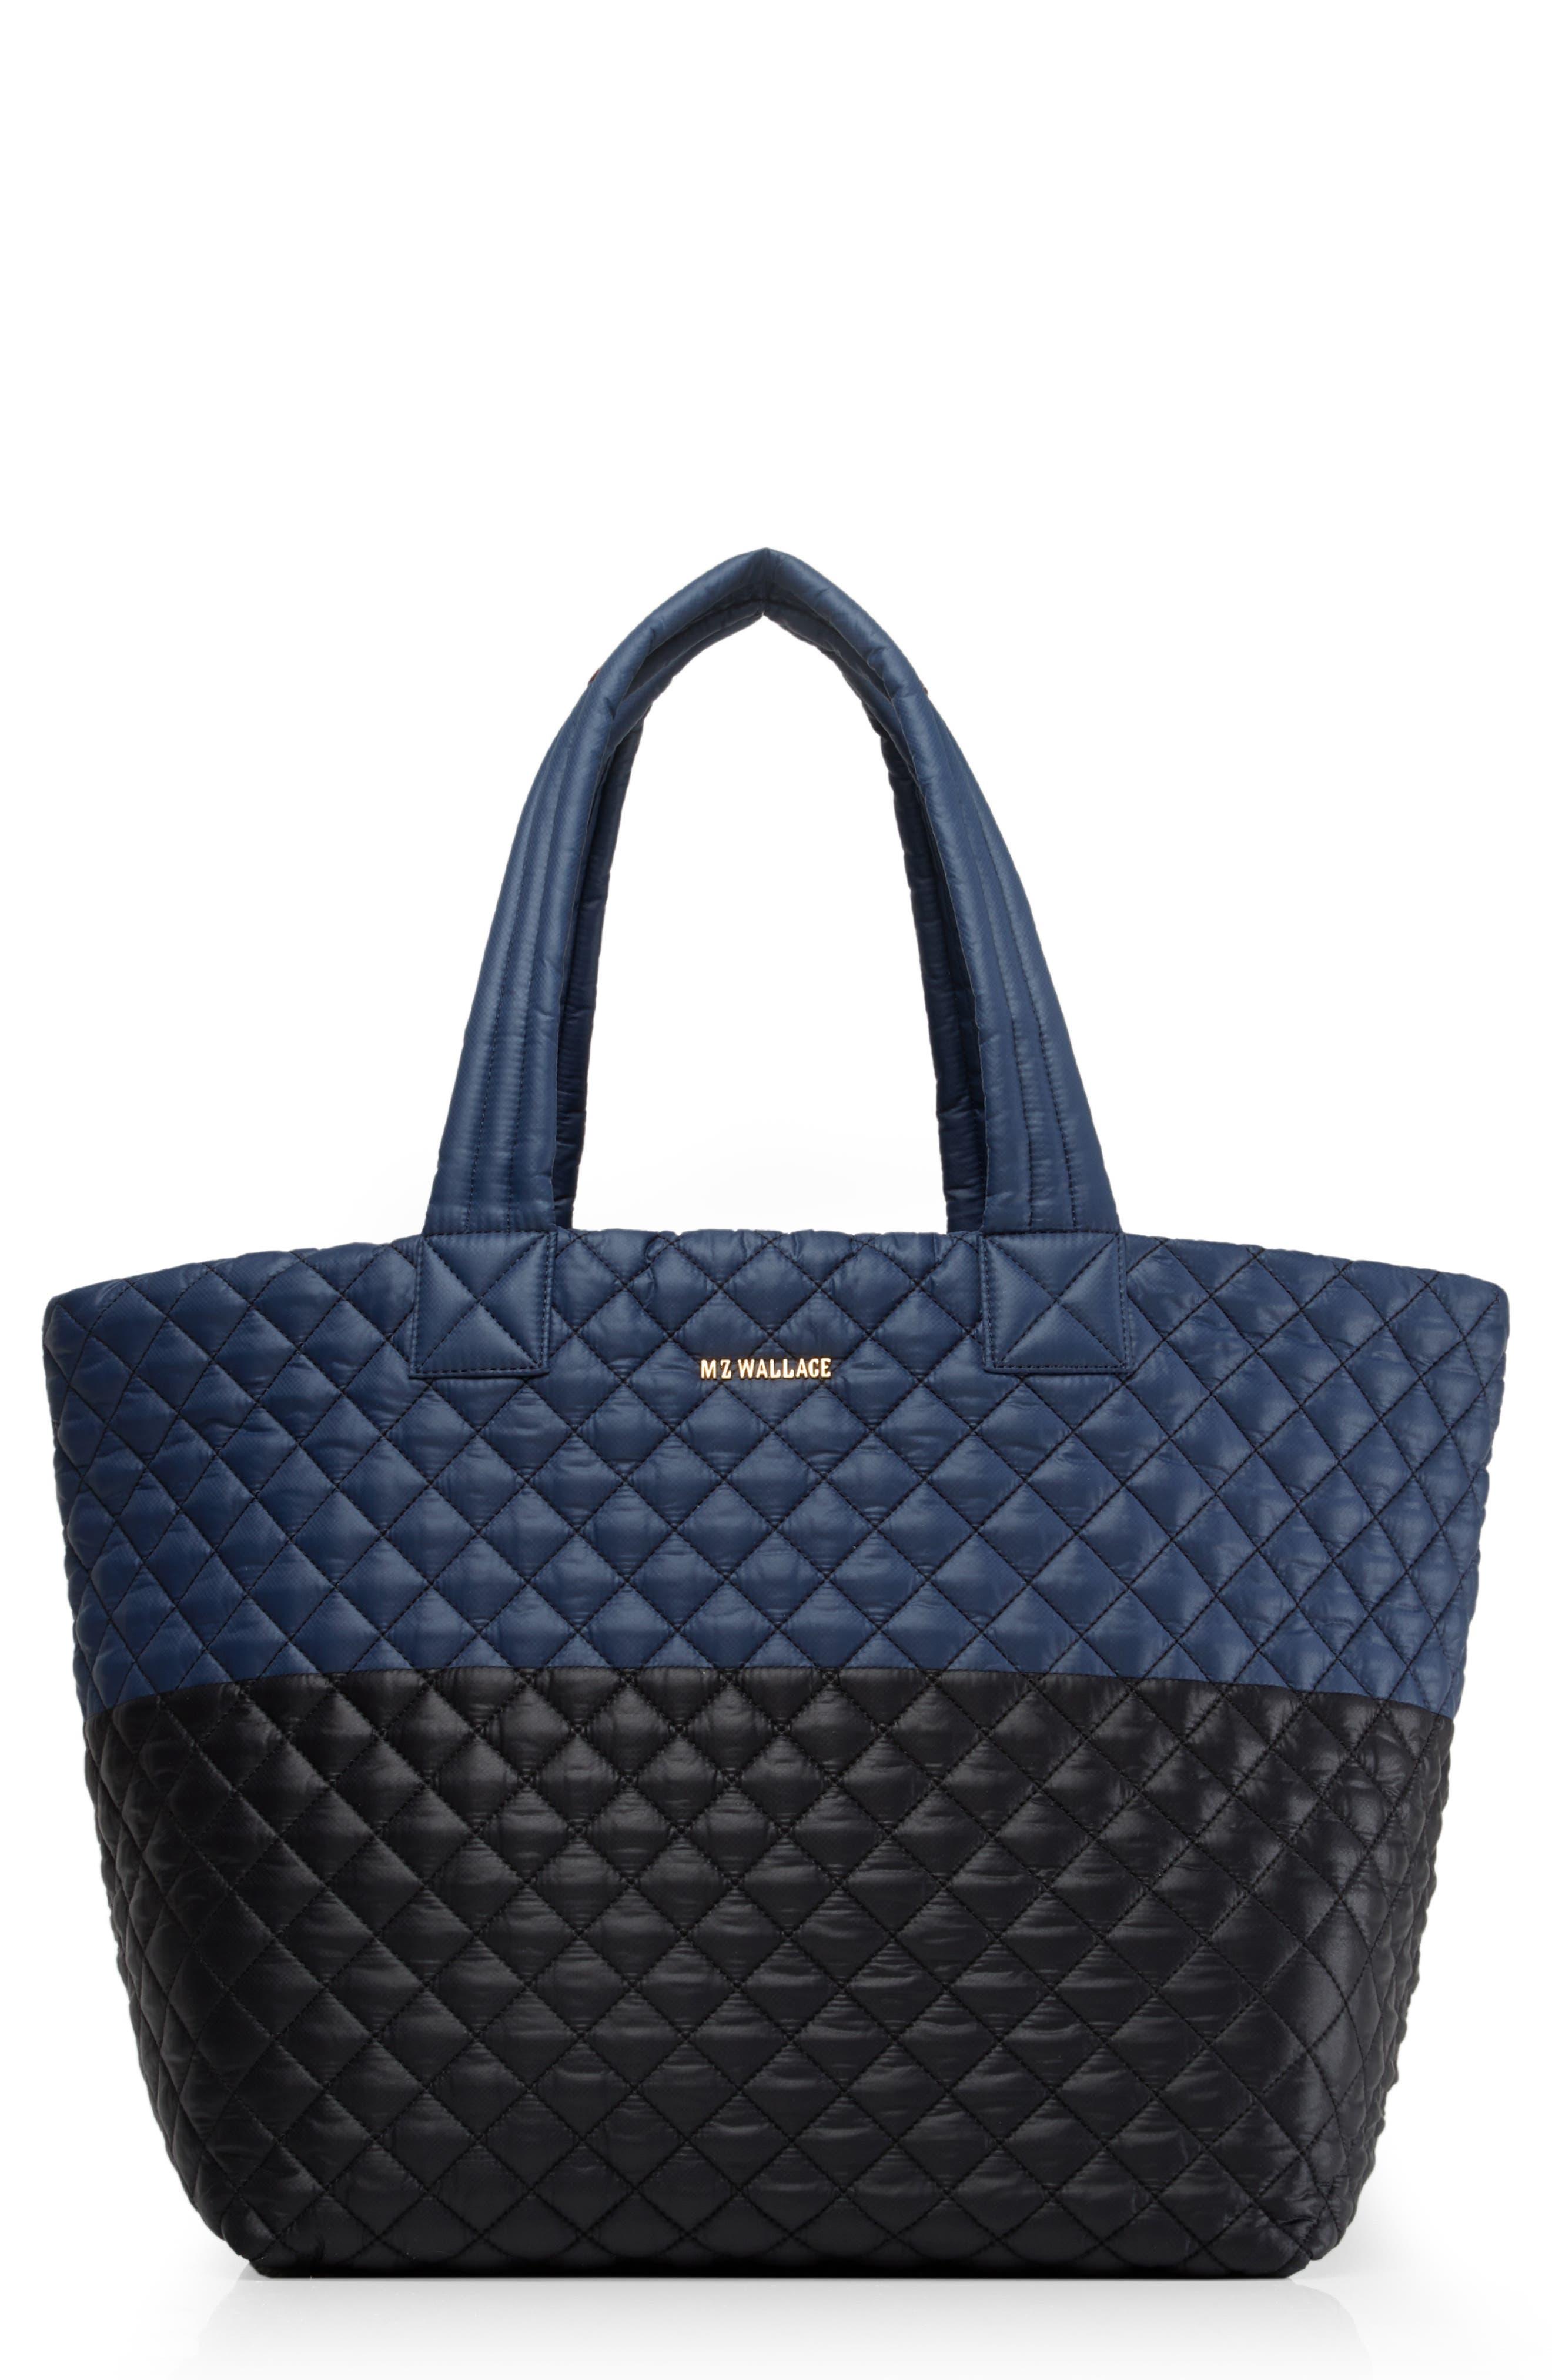 c12fec80b4b6 Handbags   Wallets for Women